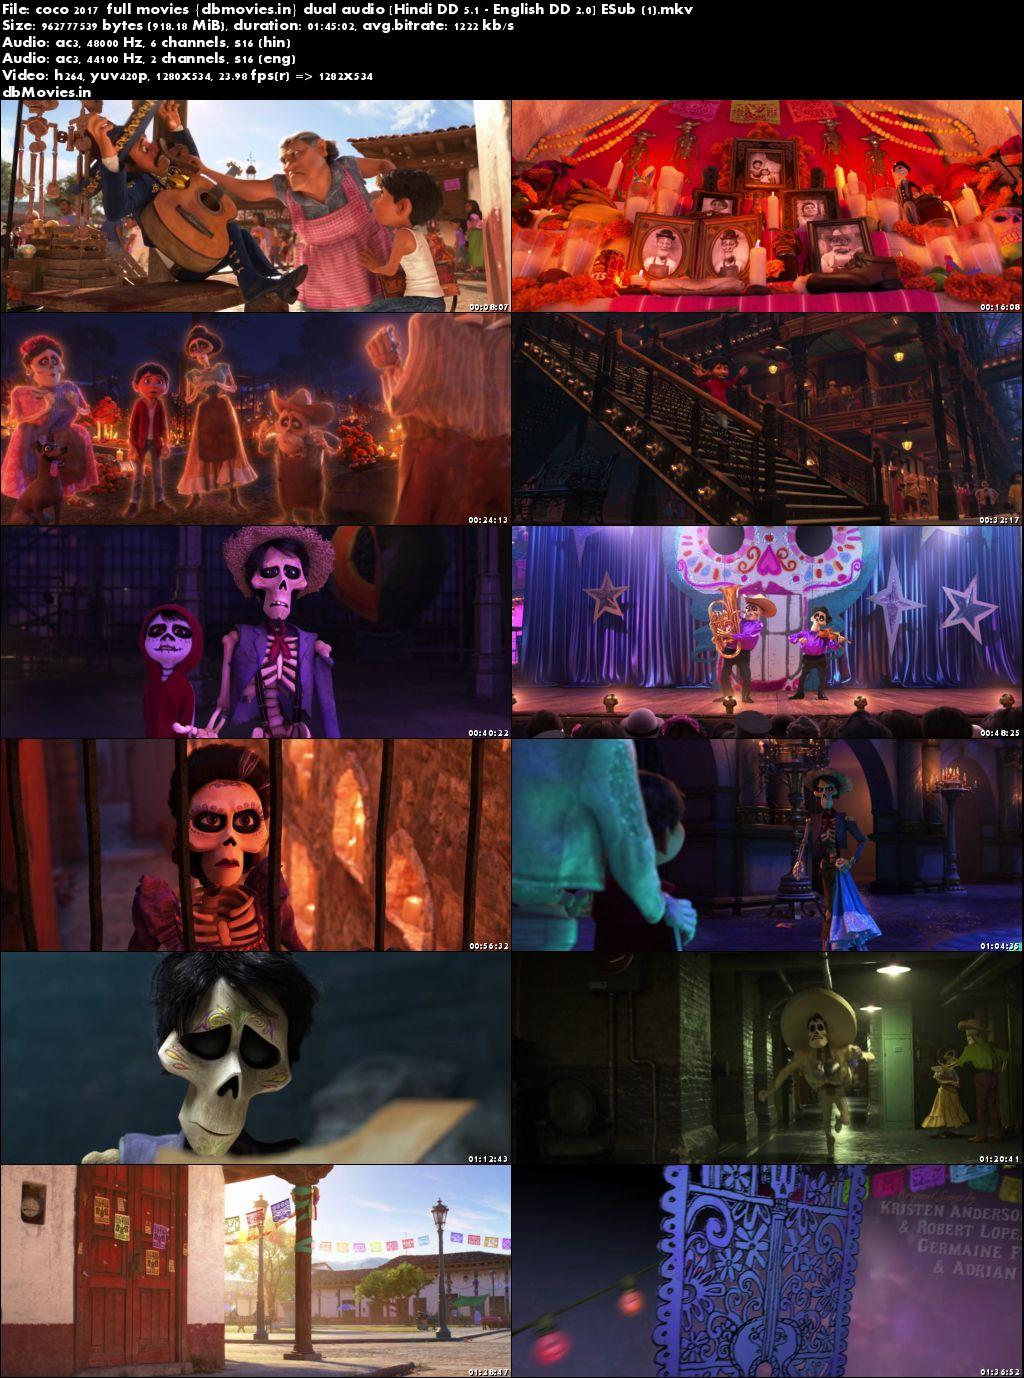 screen shot  Coco 2017 Full Movies Download Dual Audio Hindi 720p